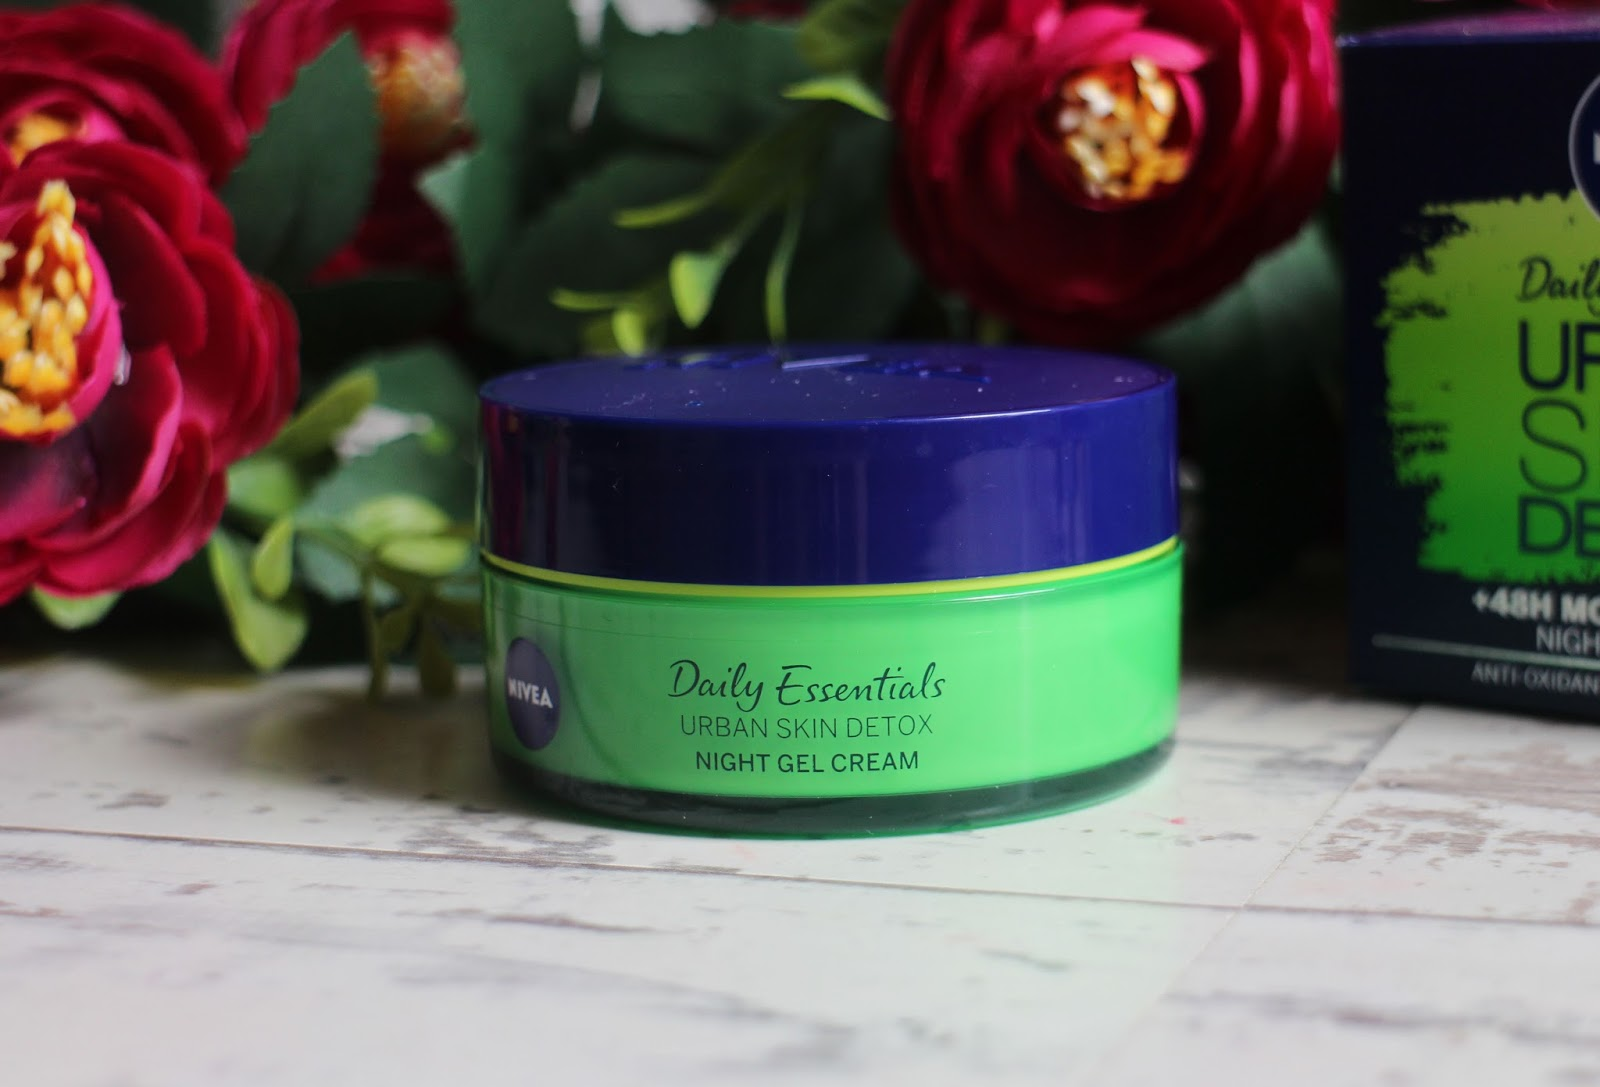 Nivea Urban Skin Defence & Detox